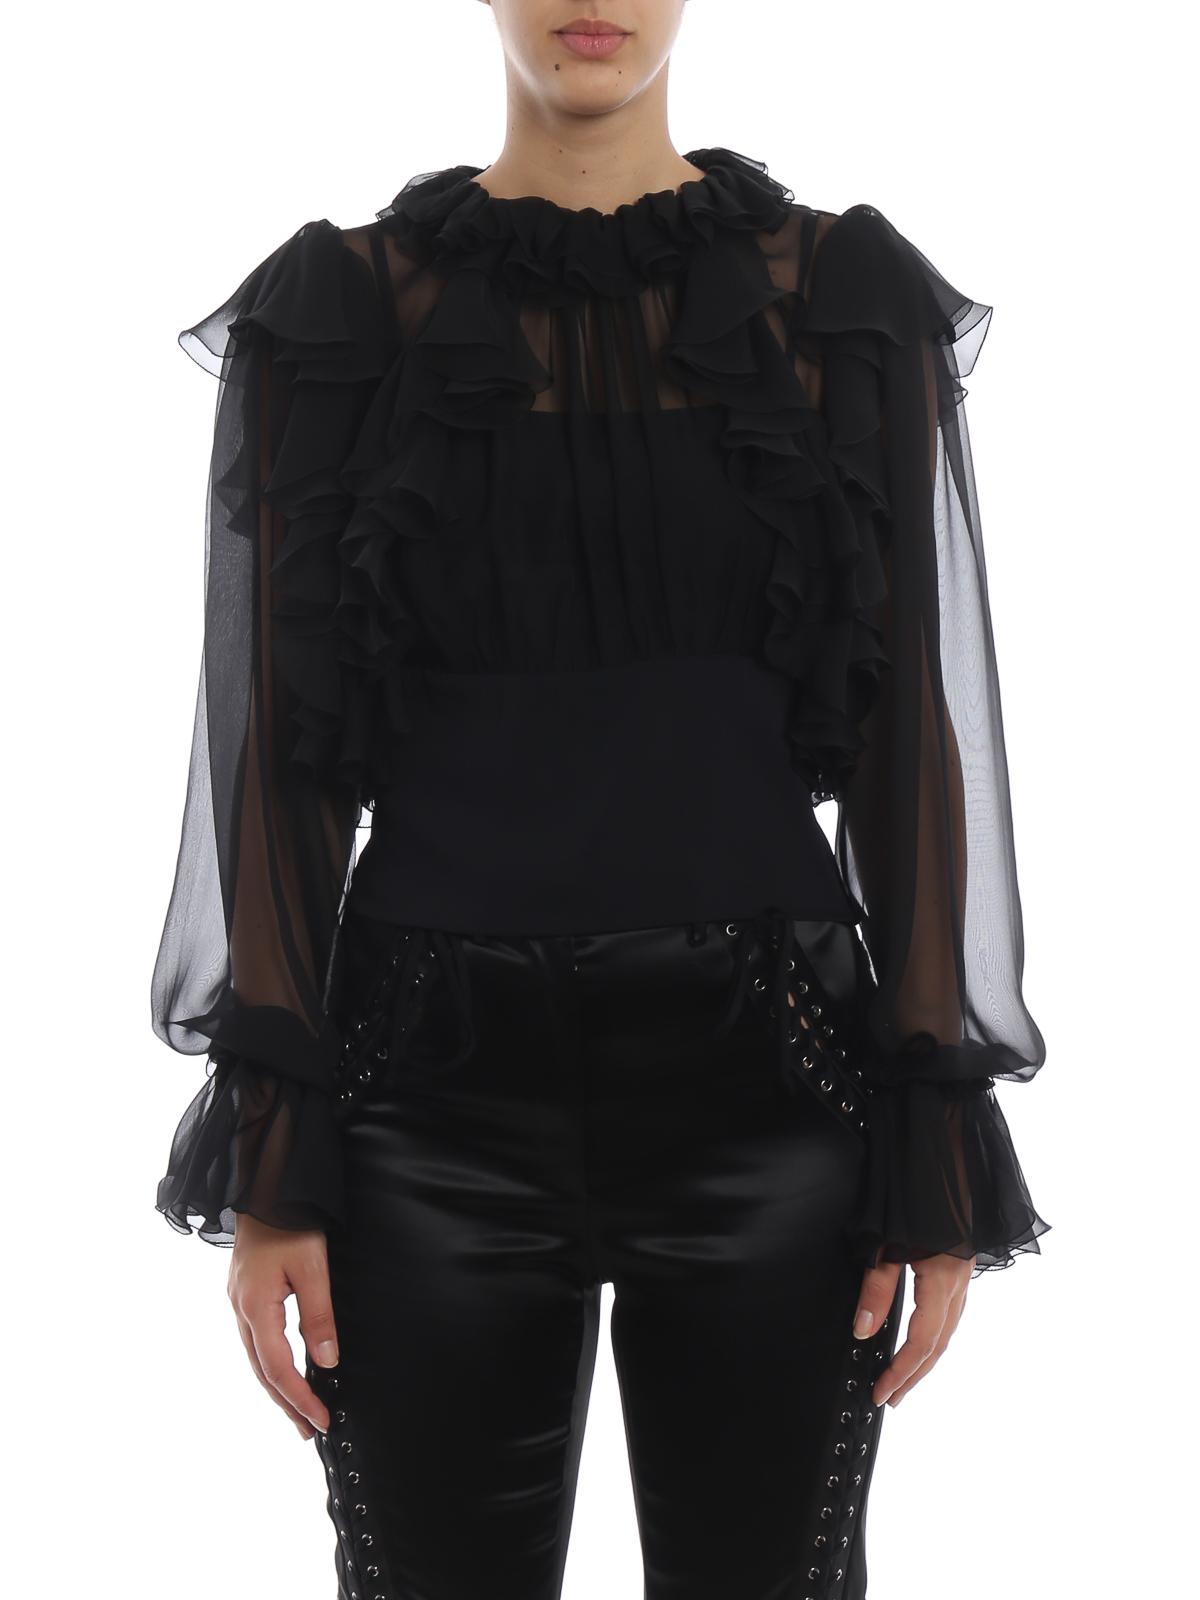 29a4e6de8d0 Dolce Gabbana Sheer Silk Chiffon Ruffle Crop Blouse Blouses